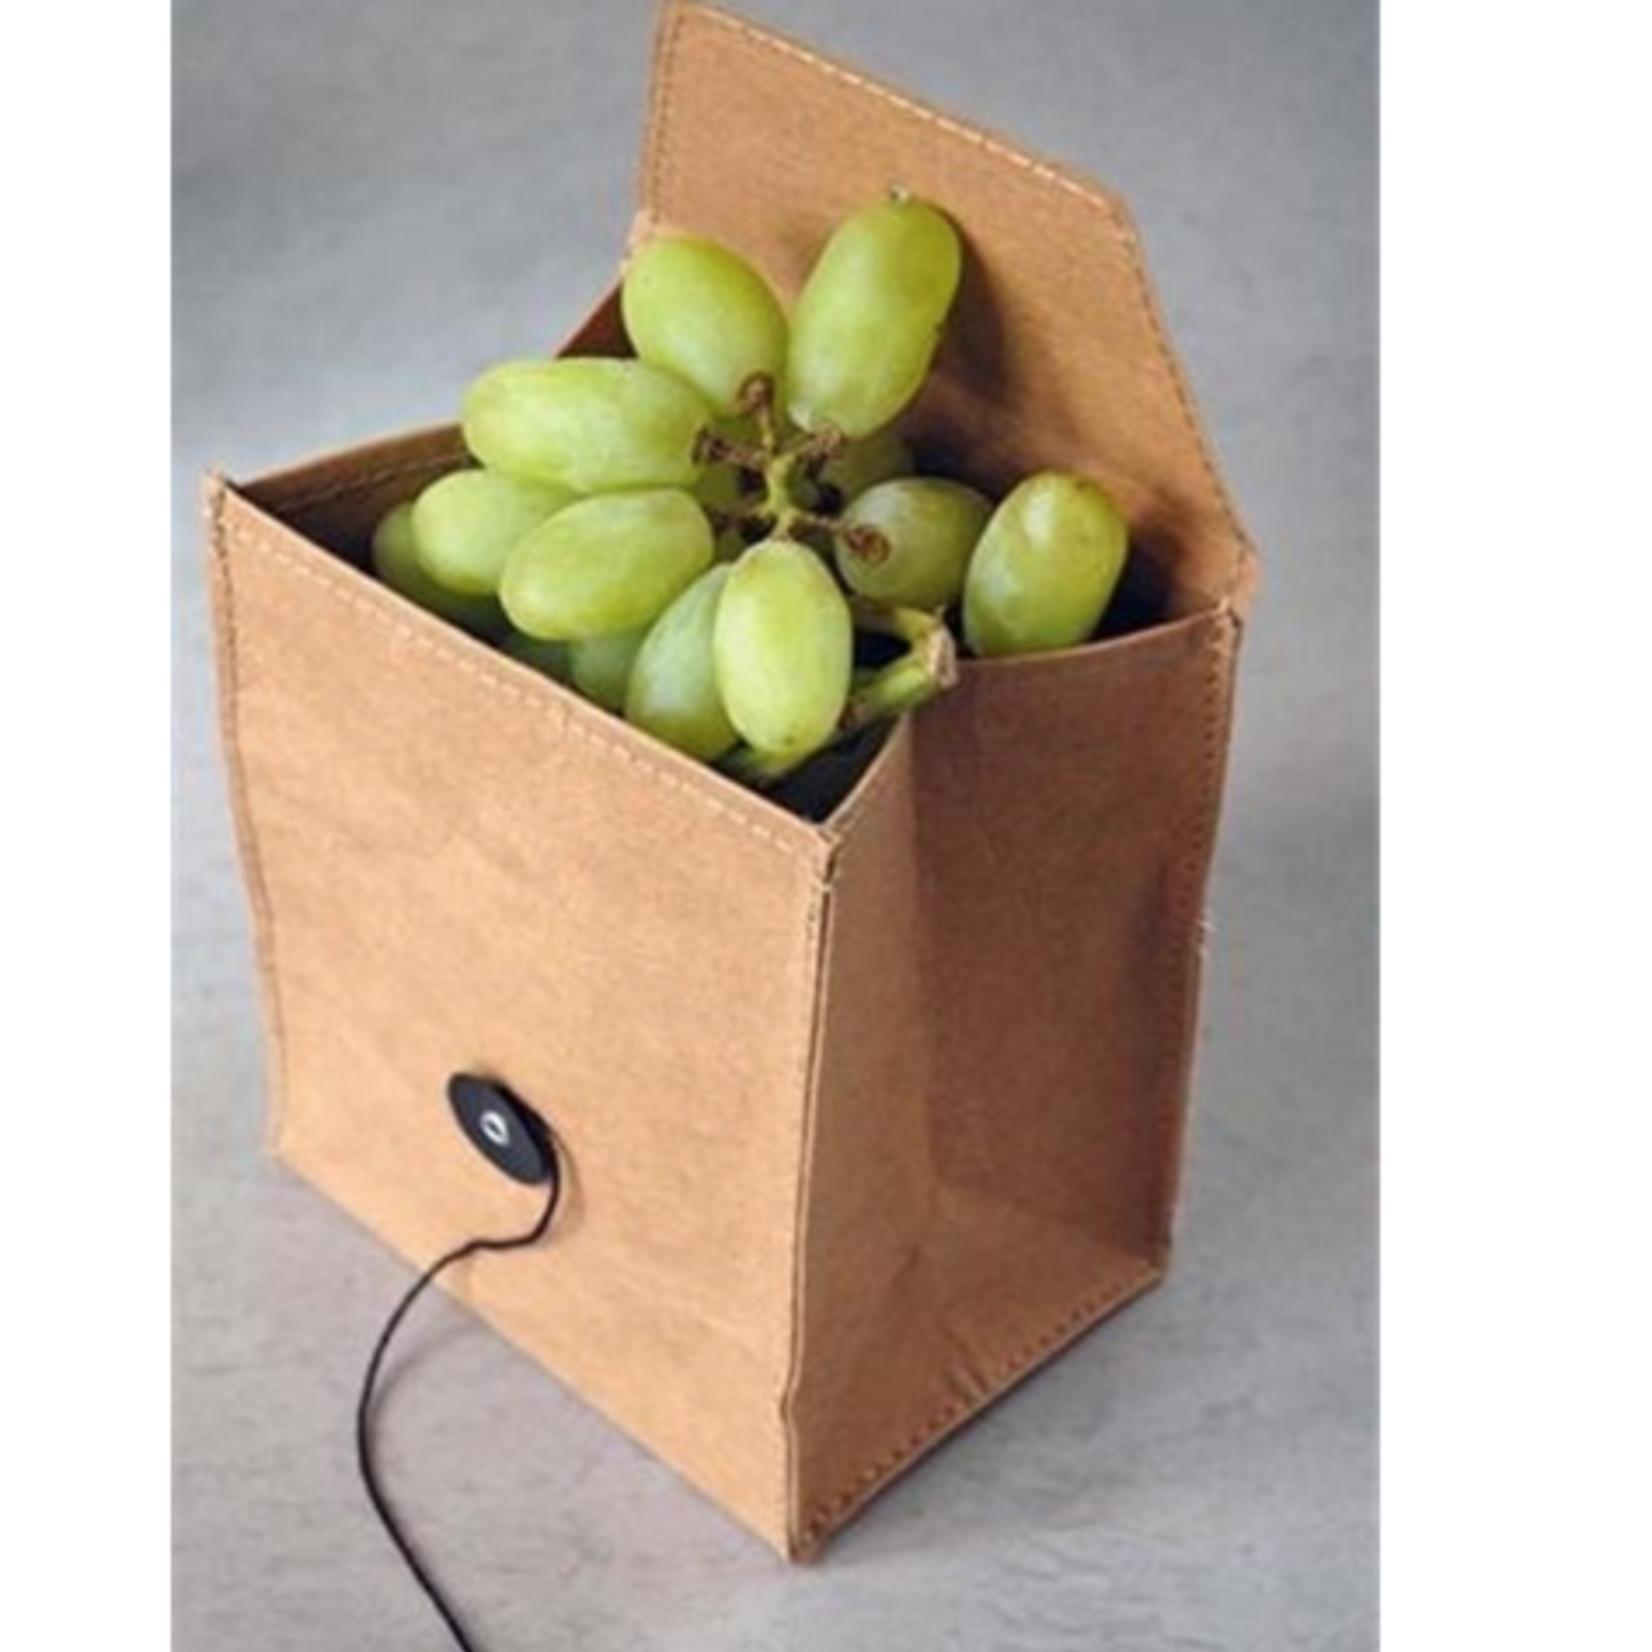 Zuperzozial Fruit Bag